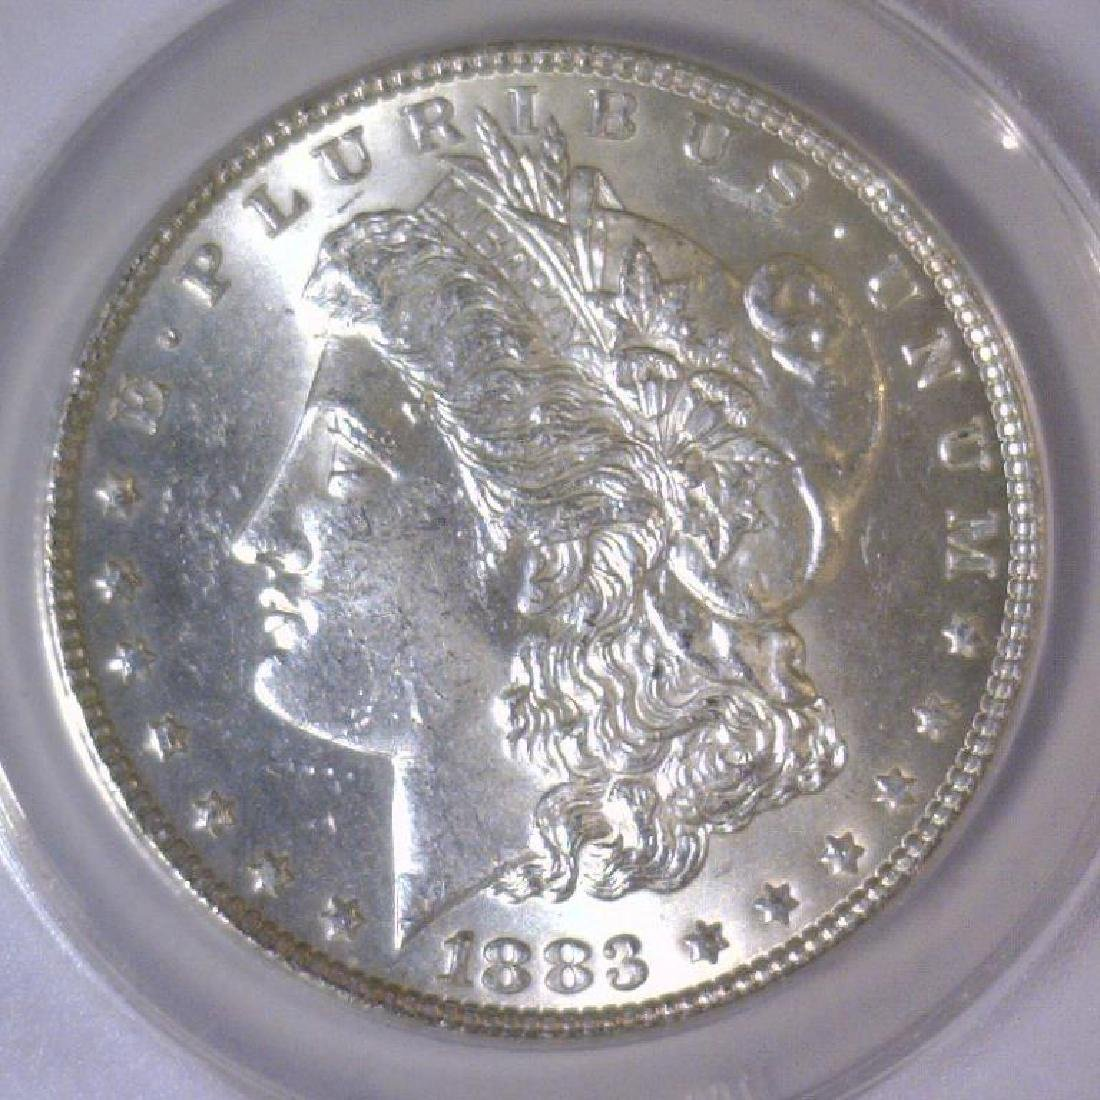 1883 Morgan Silver Dollar ANACS MS63